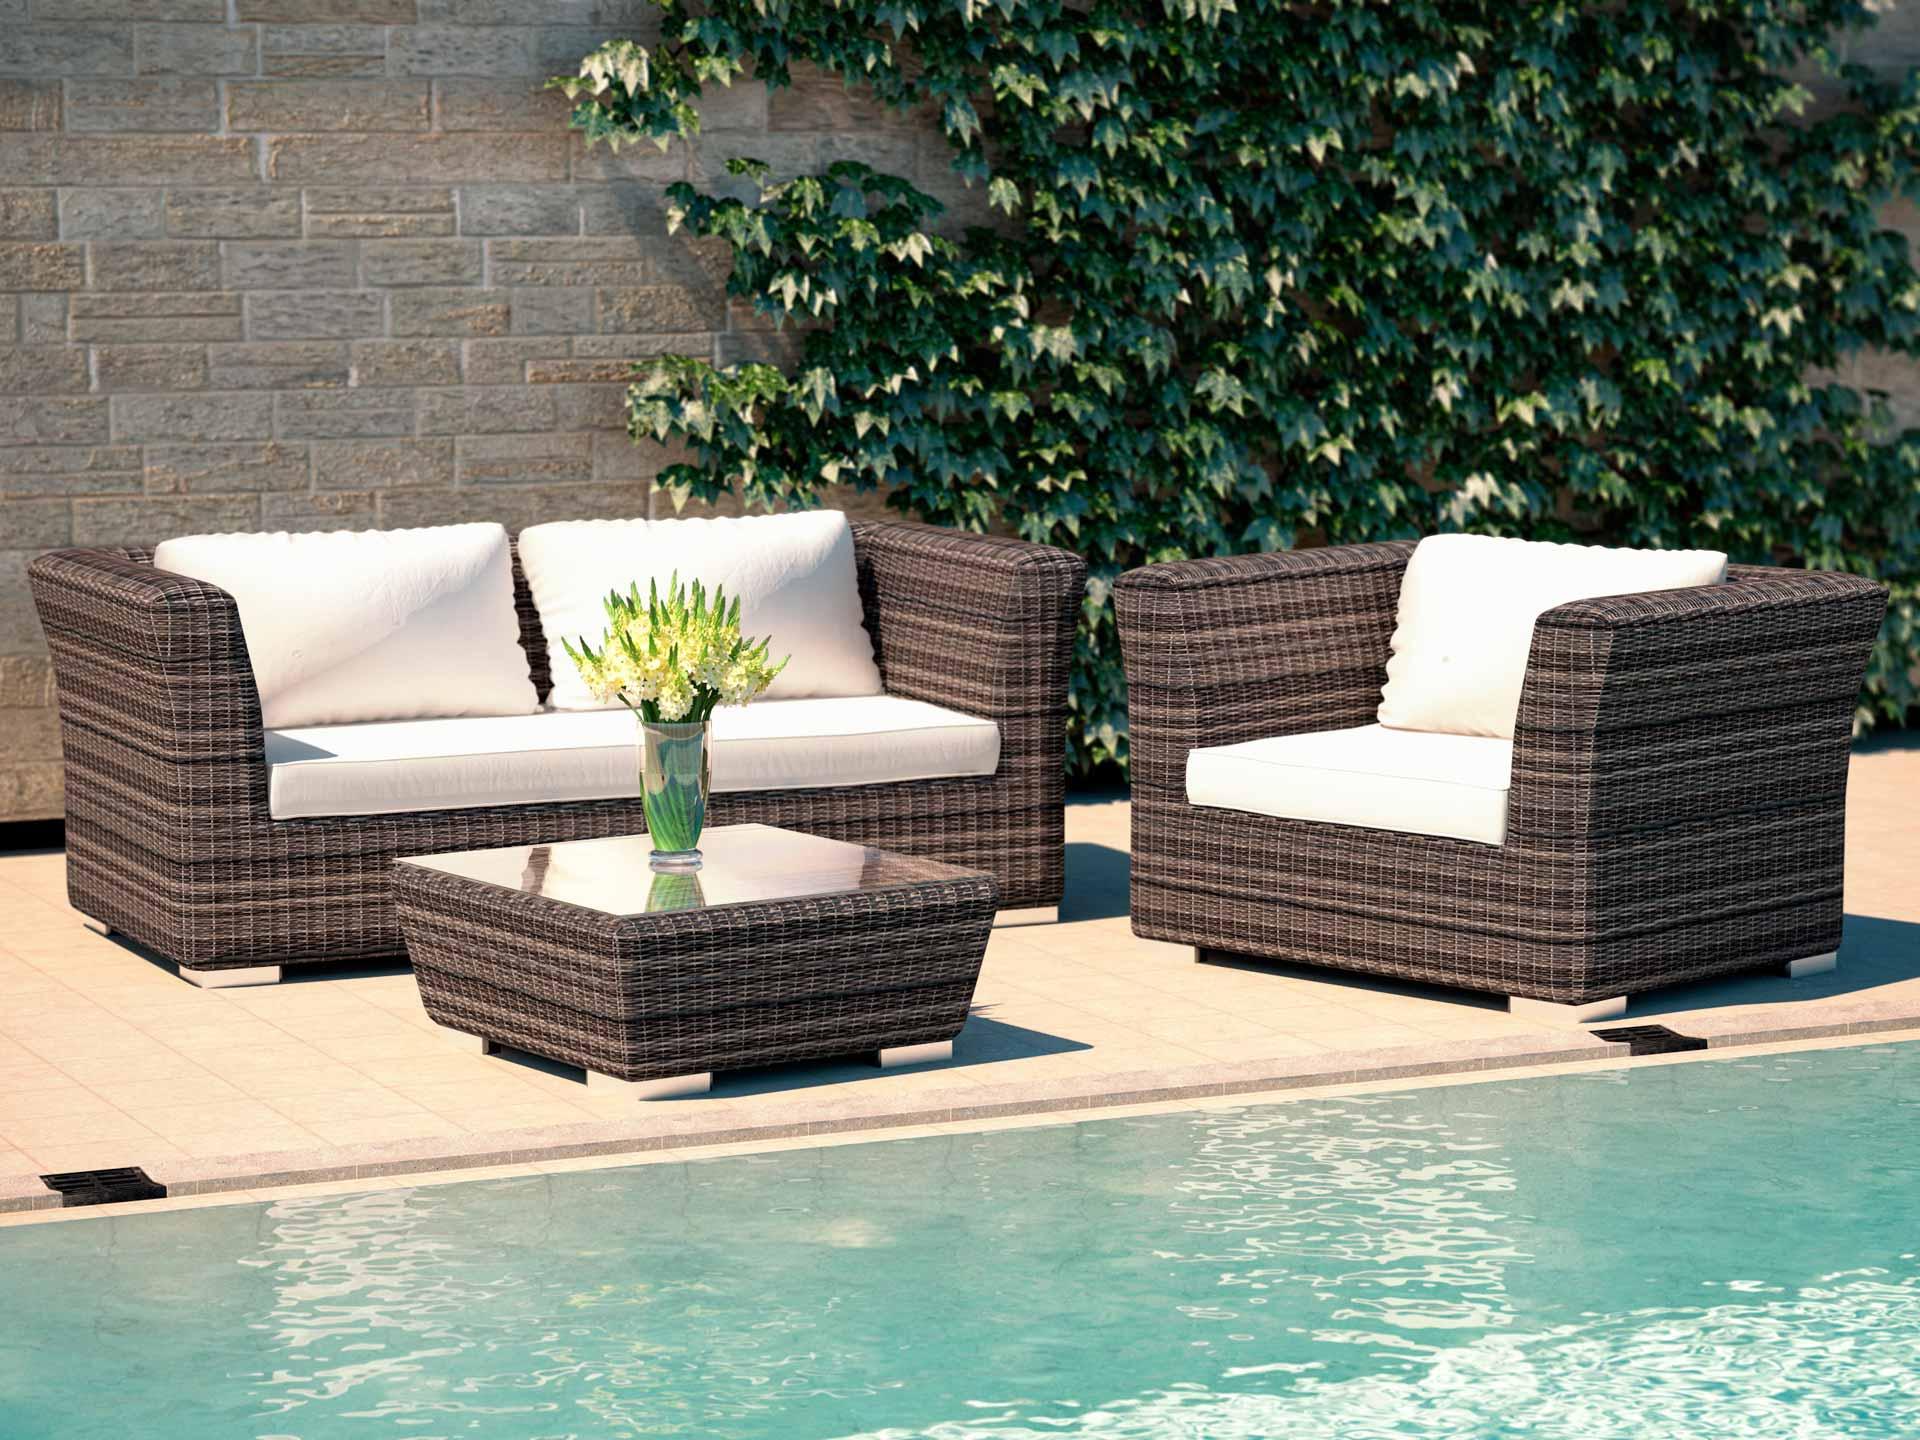 artelia terrassenm bel sitzgruppe rigantona s aus polyrattan. Black Bedroom Furniture Sets. Home Design Ideas